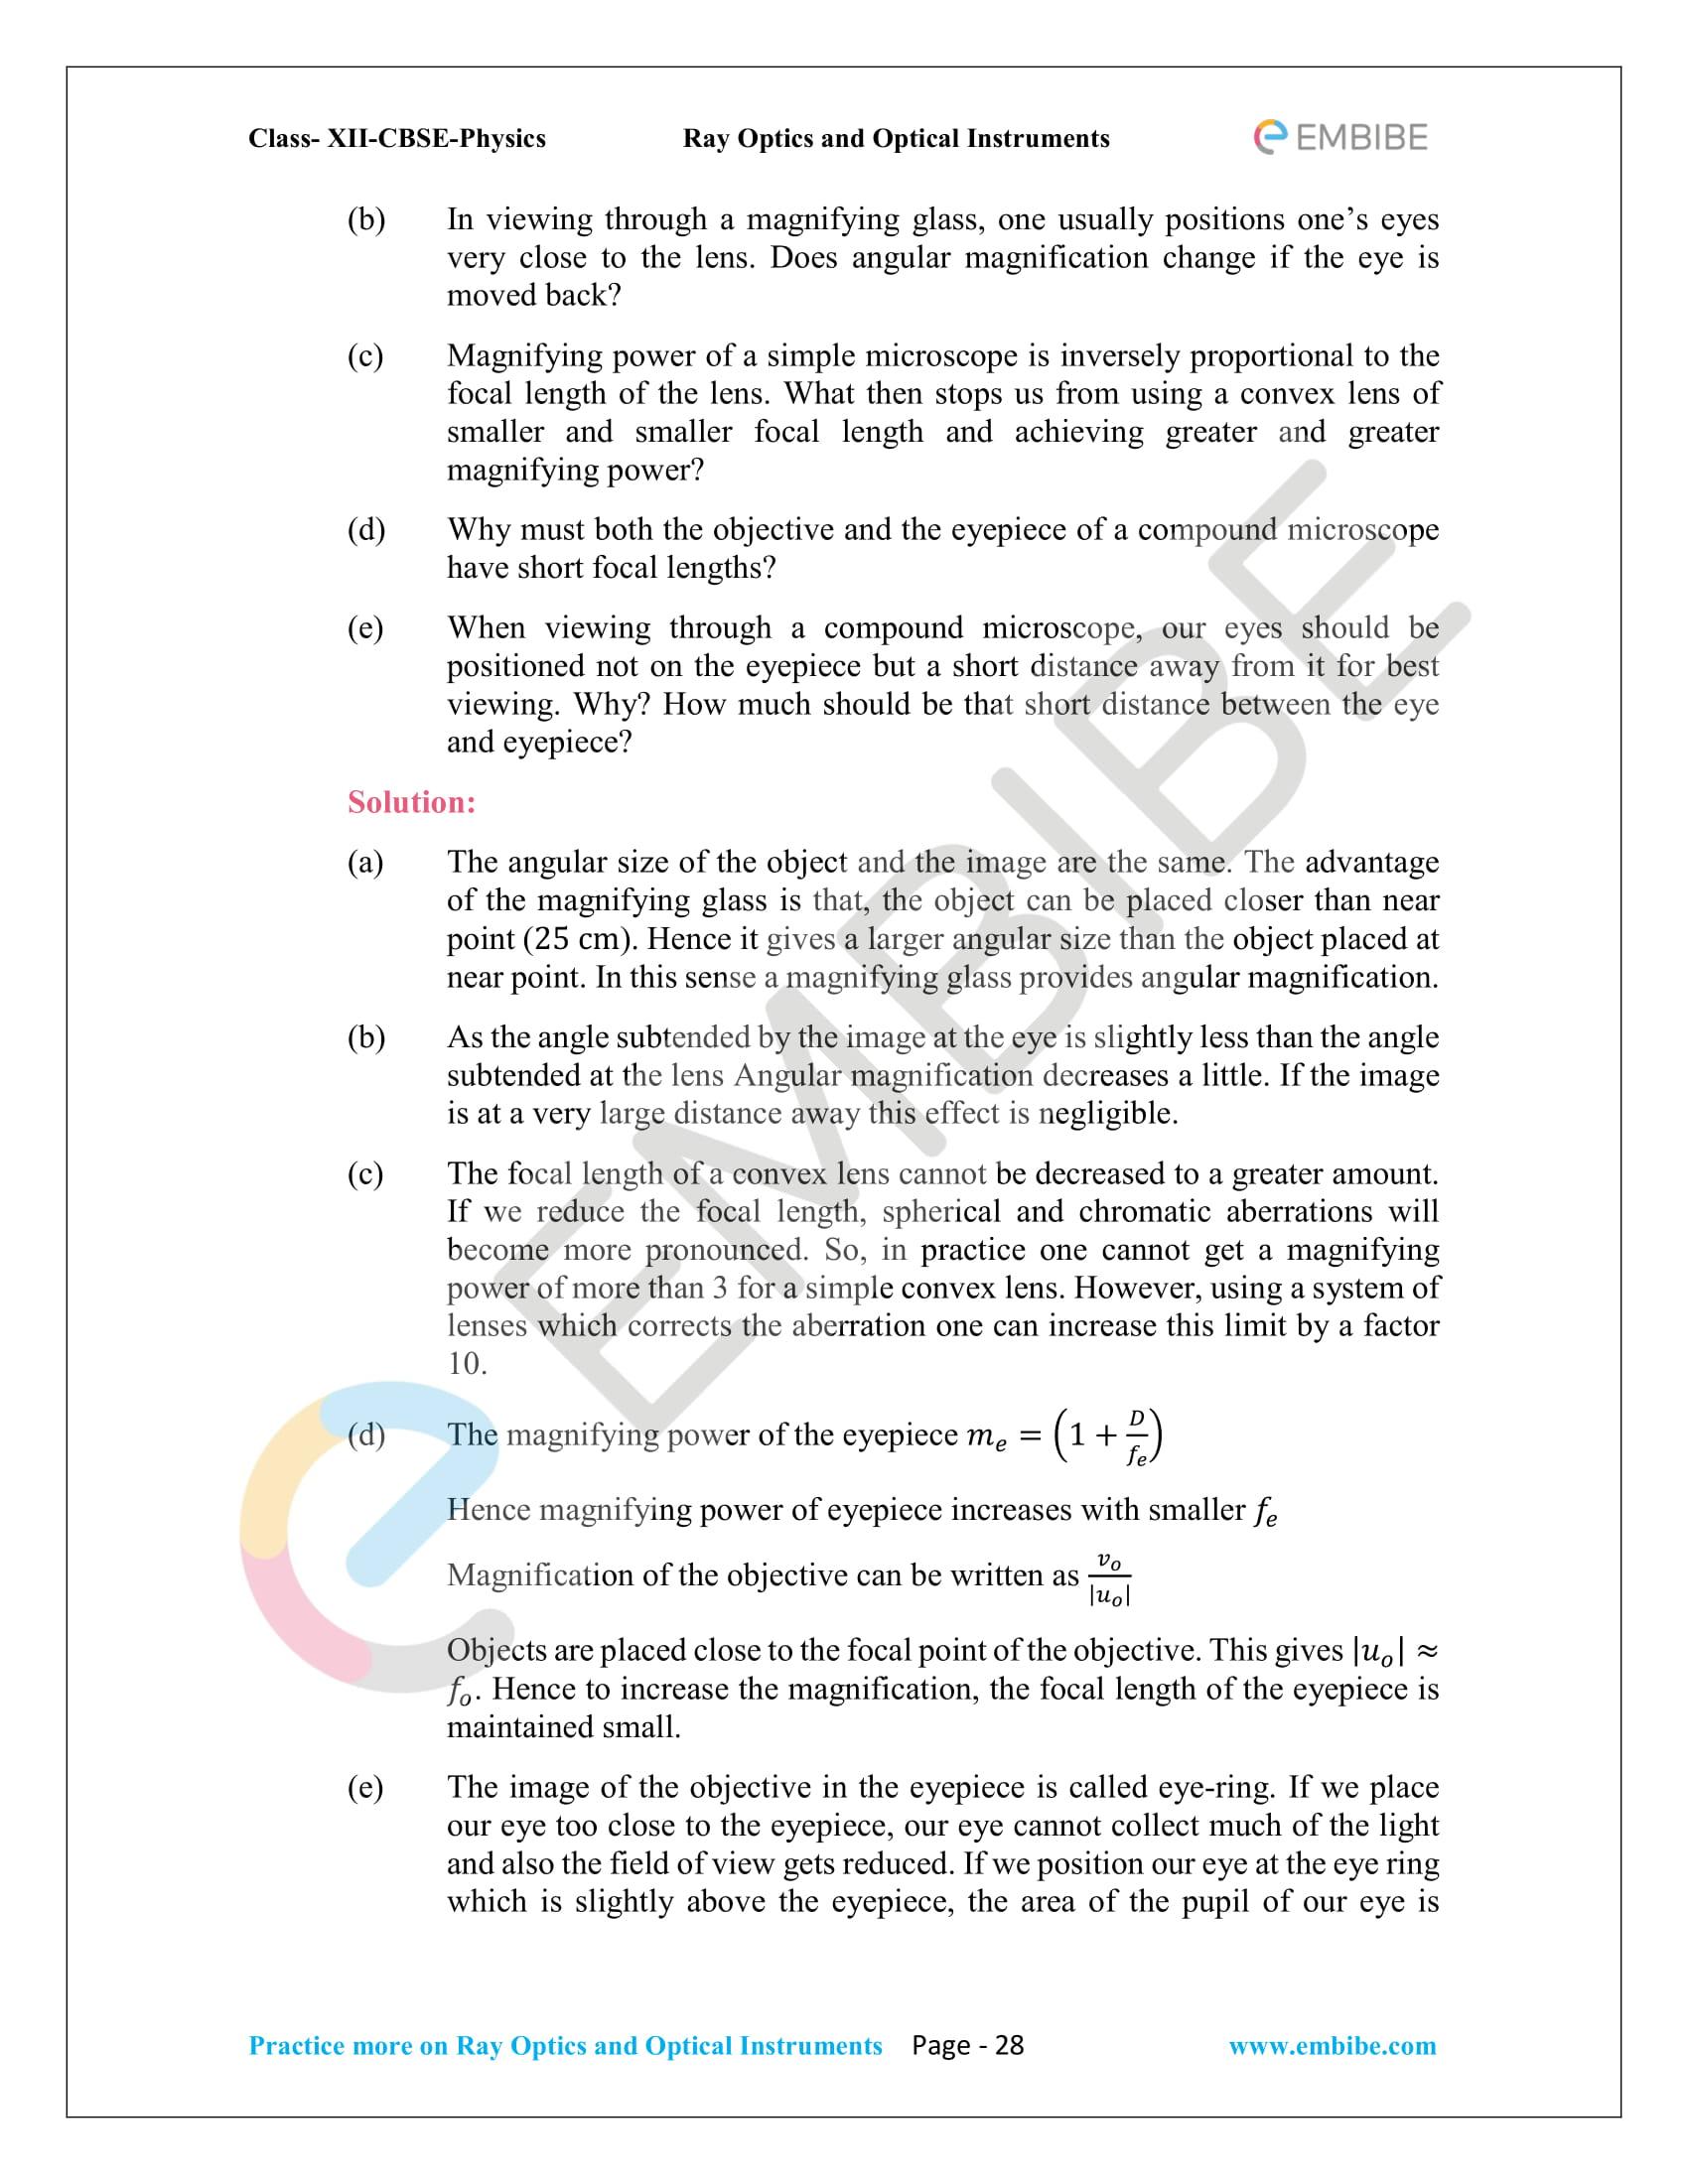 NCERT_Grade 12_Physics_Ch_09_Ray Optics-28